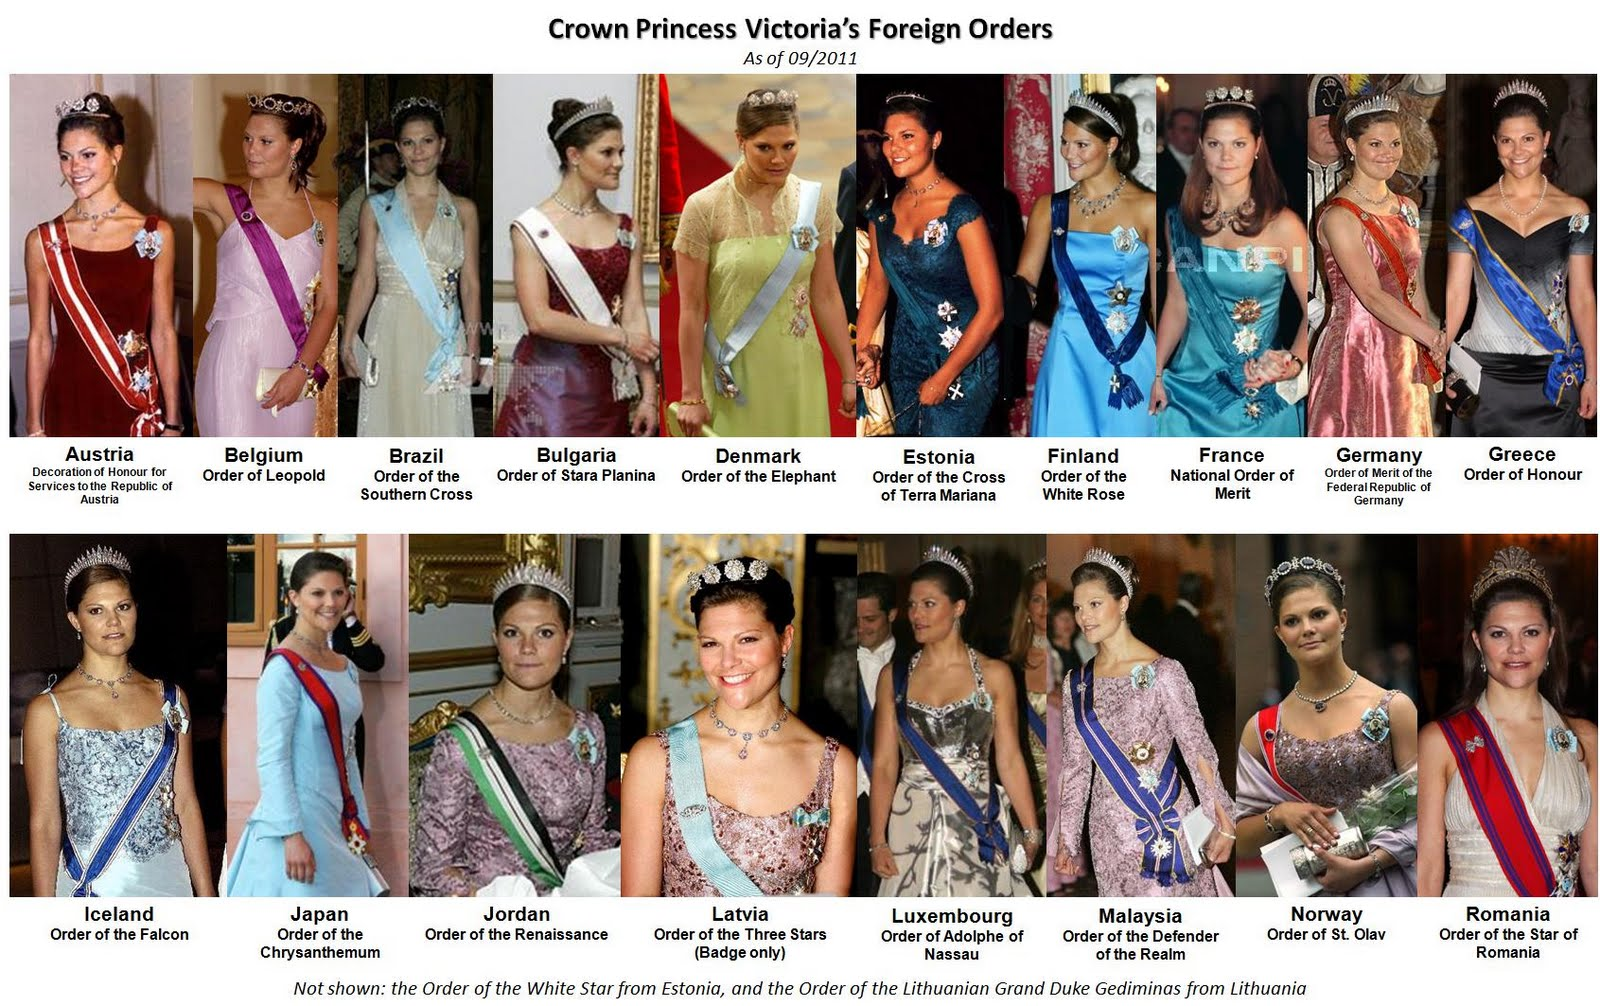 http://4.bp.blogspot.com/-STxkNoKf77c/Tm7o0RDZ63I/AAAAAAAADdw/2P2K6vE-EQU/s1600/CrownPrincessVictoriaForeignOrders.jpg